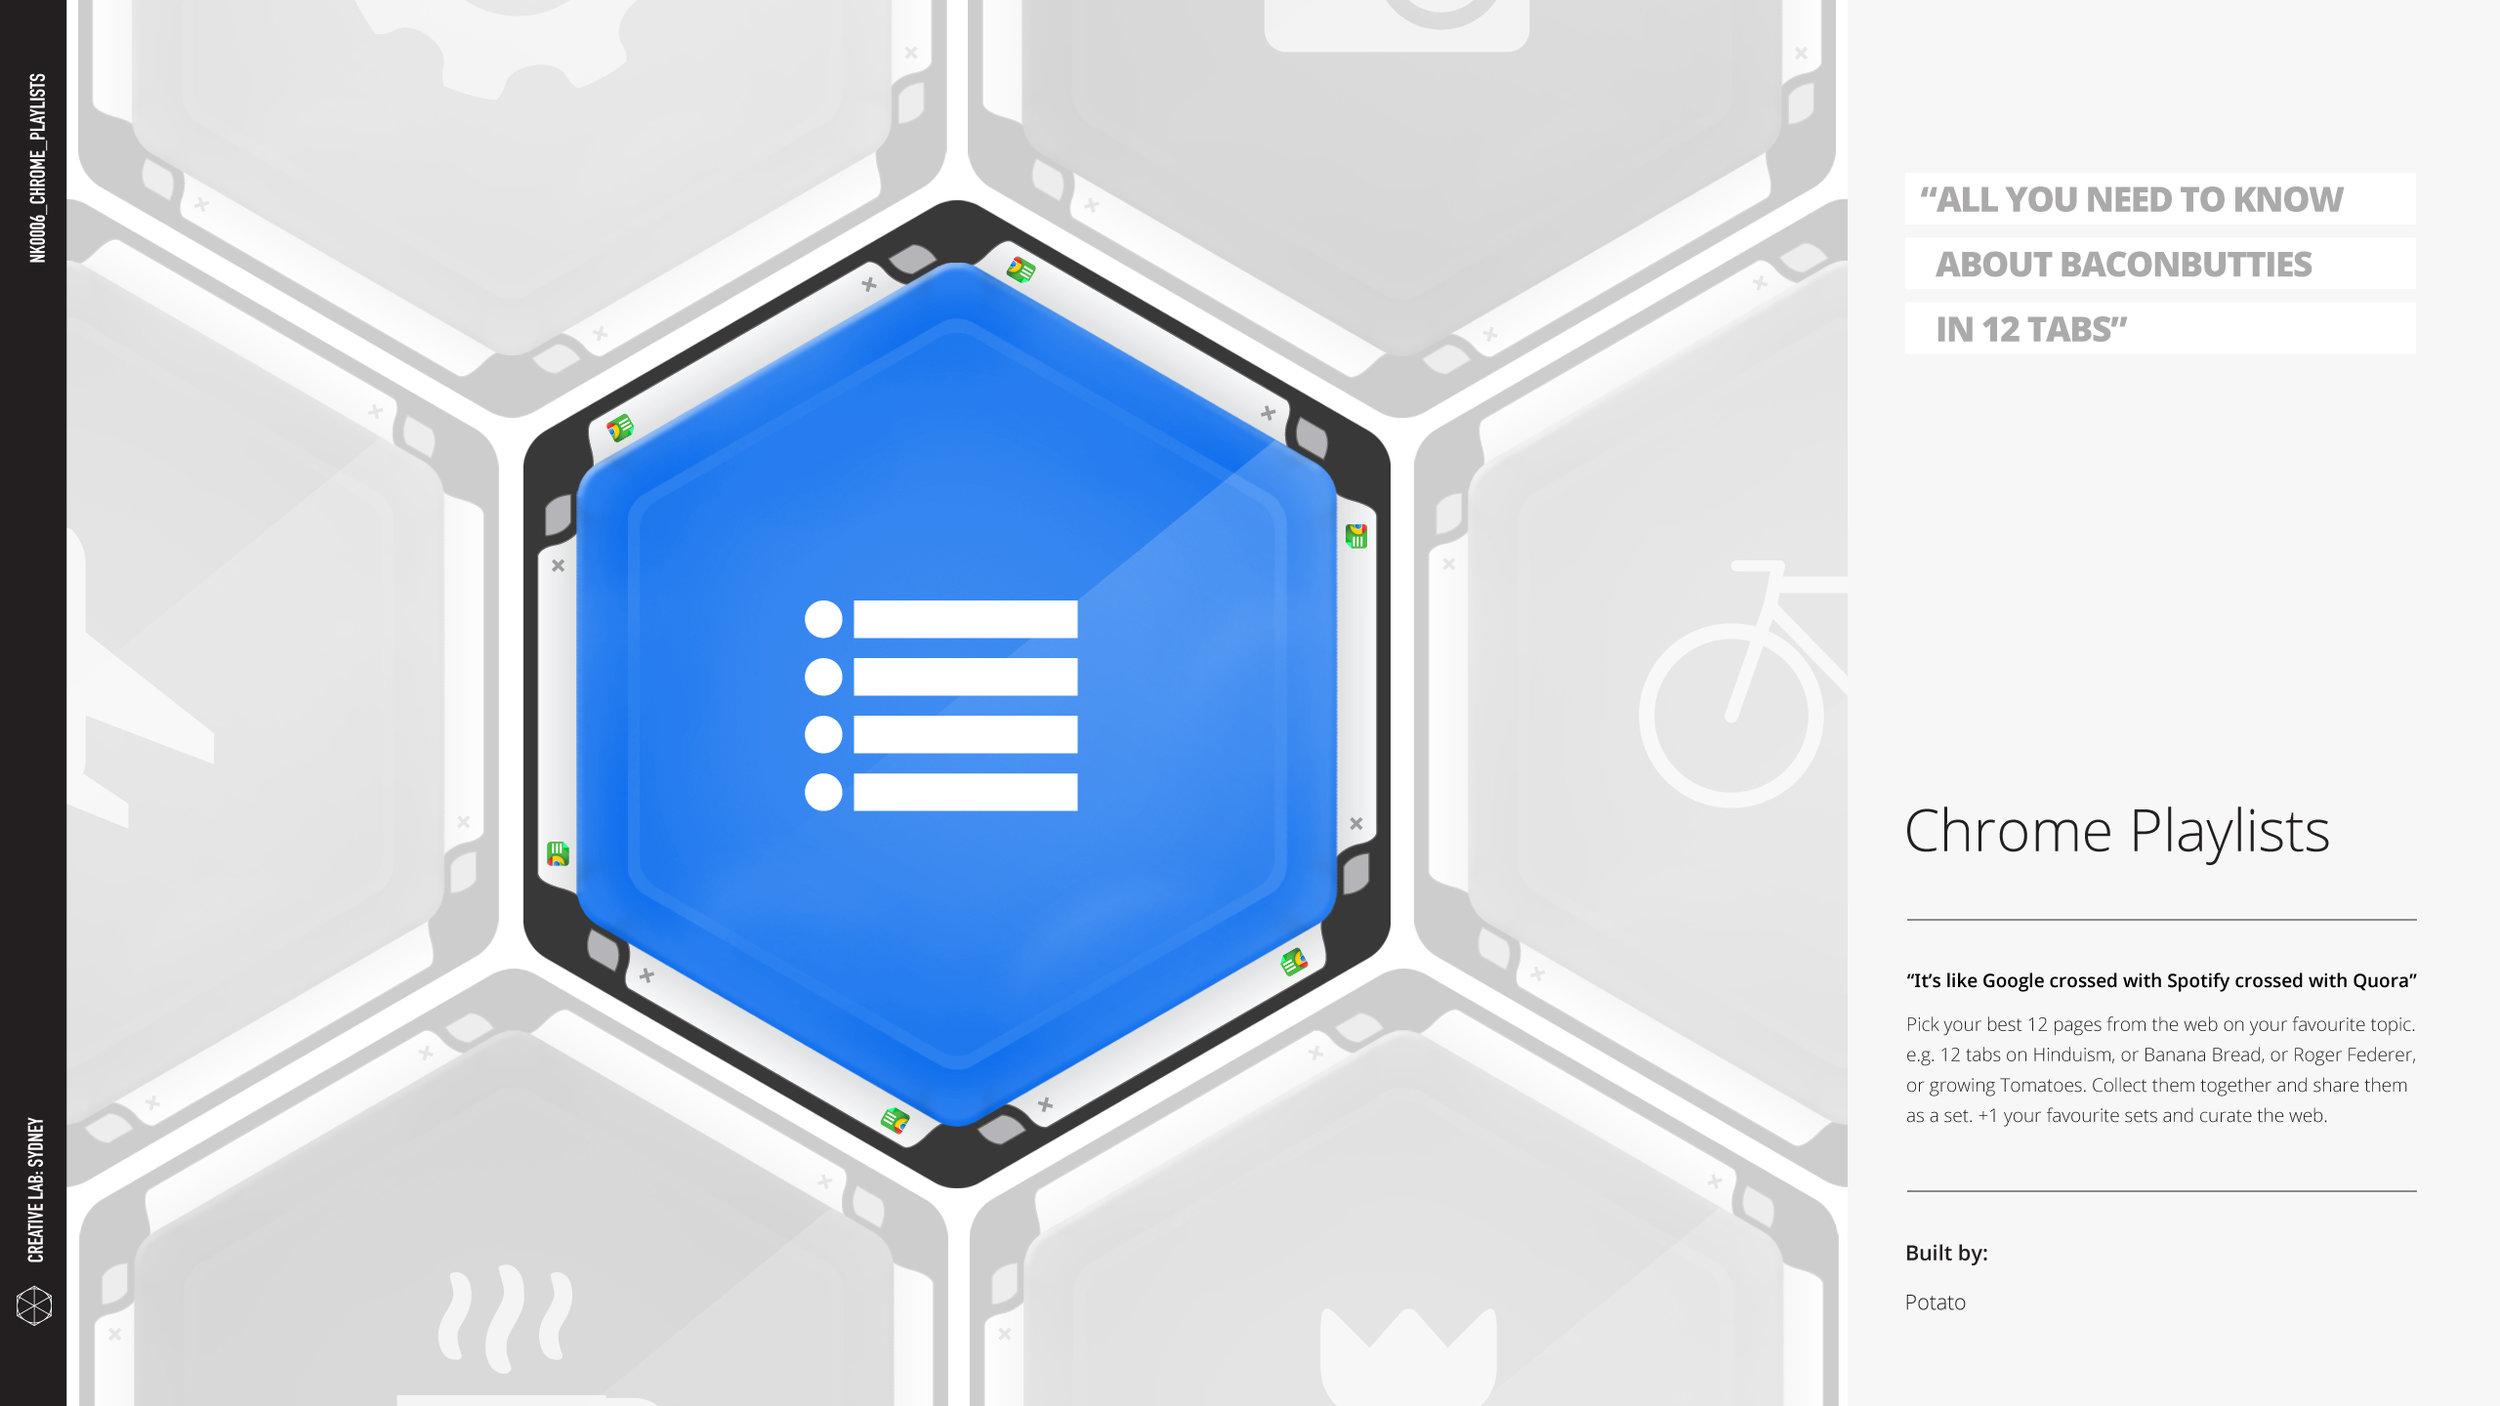 NK0006---Chrome-Playlist-Screen-01.jpg